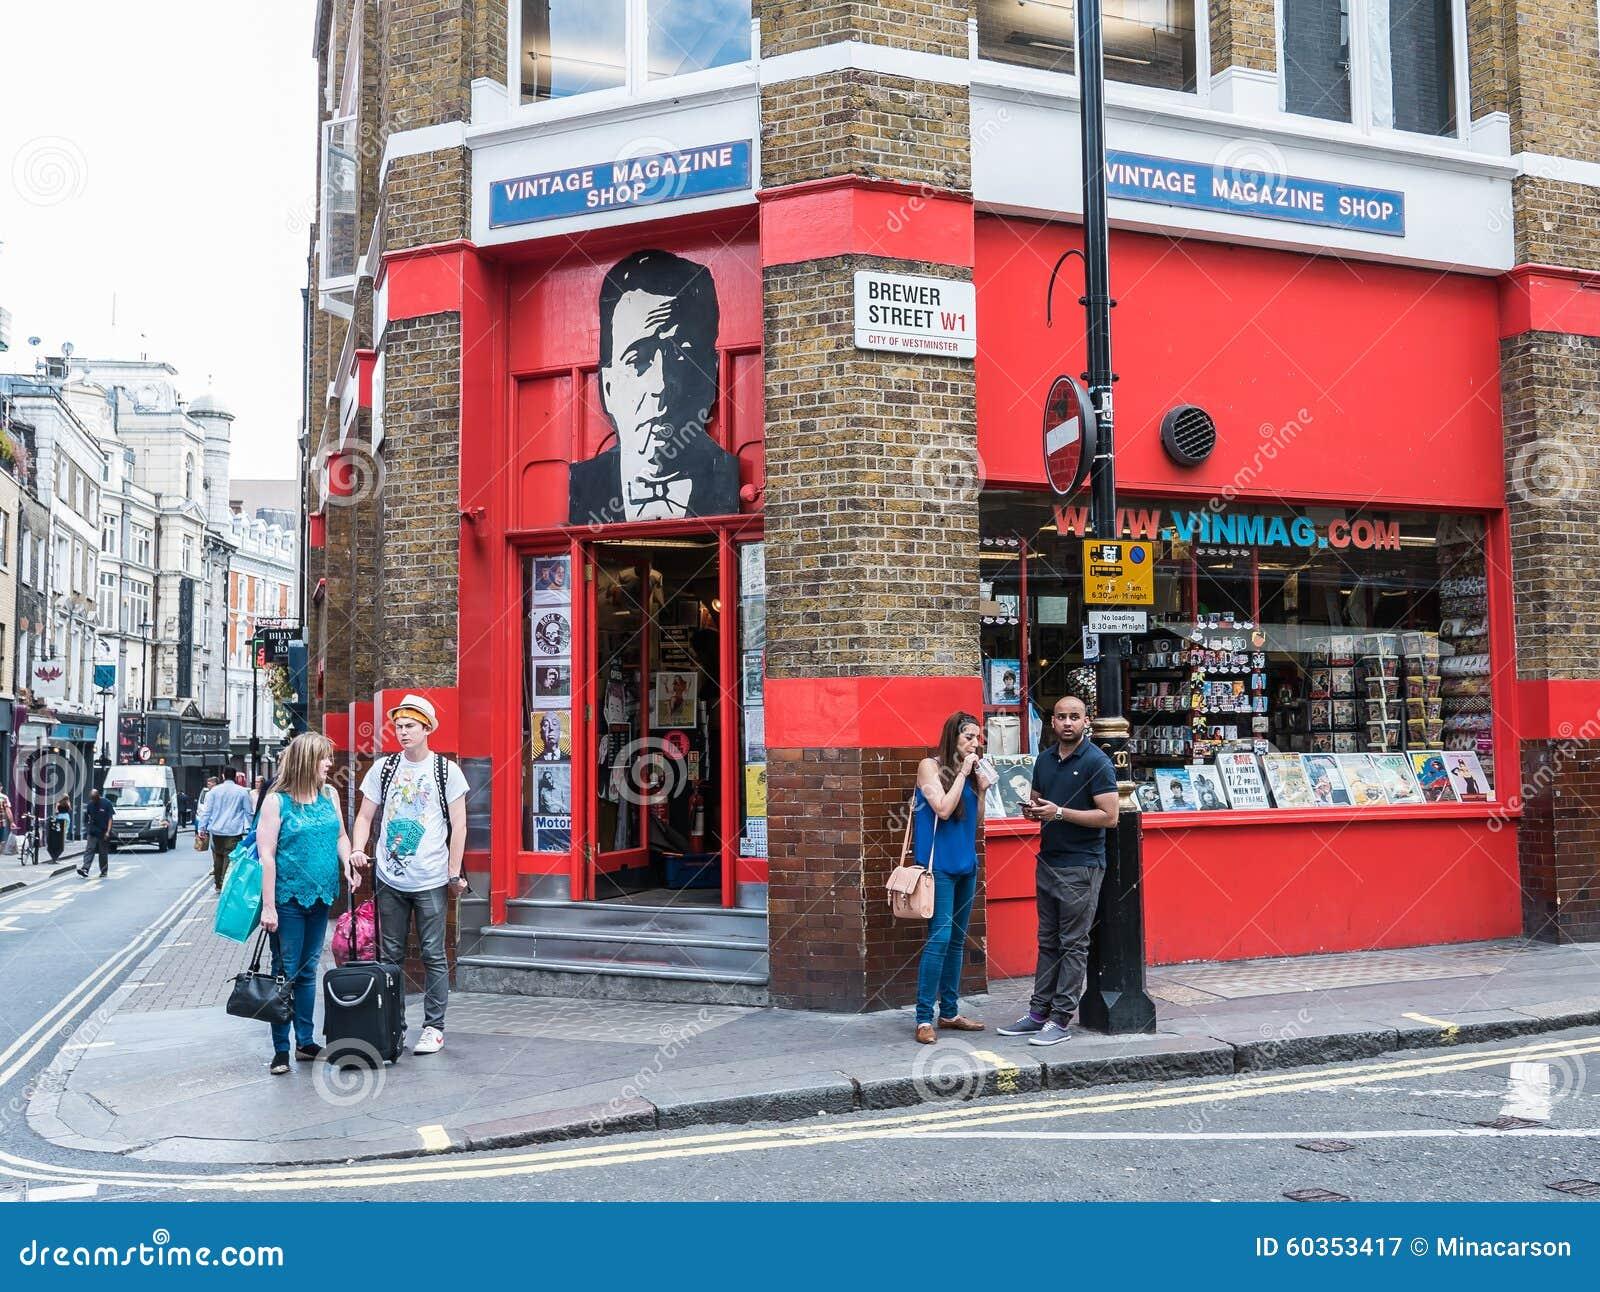 Exterior of Vintage Magazine Shop, Brewer Street, London W1